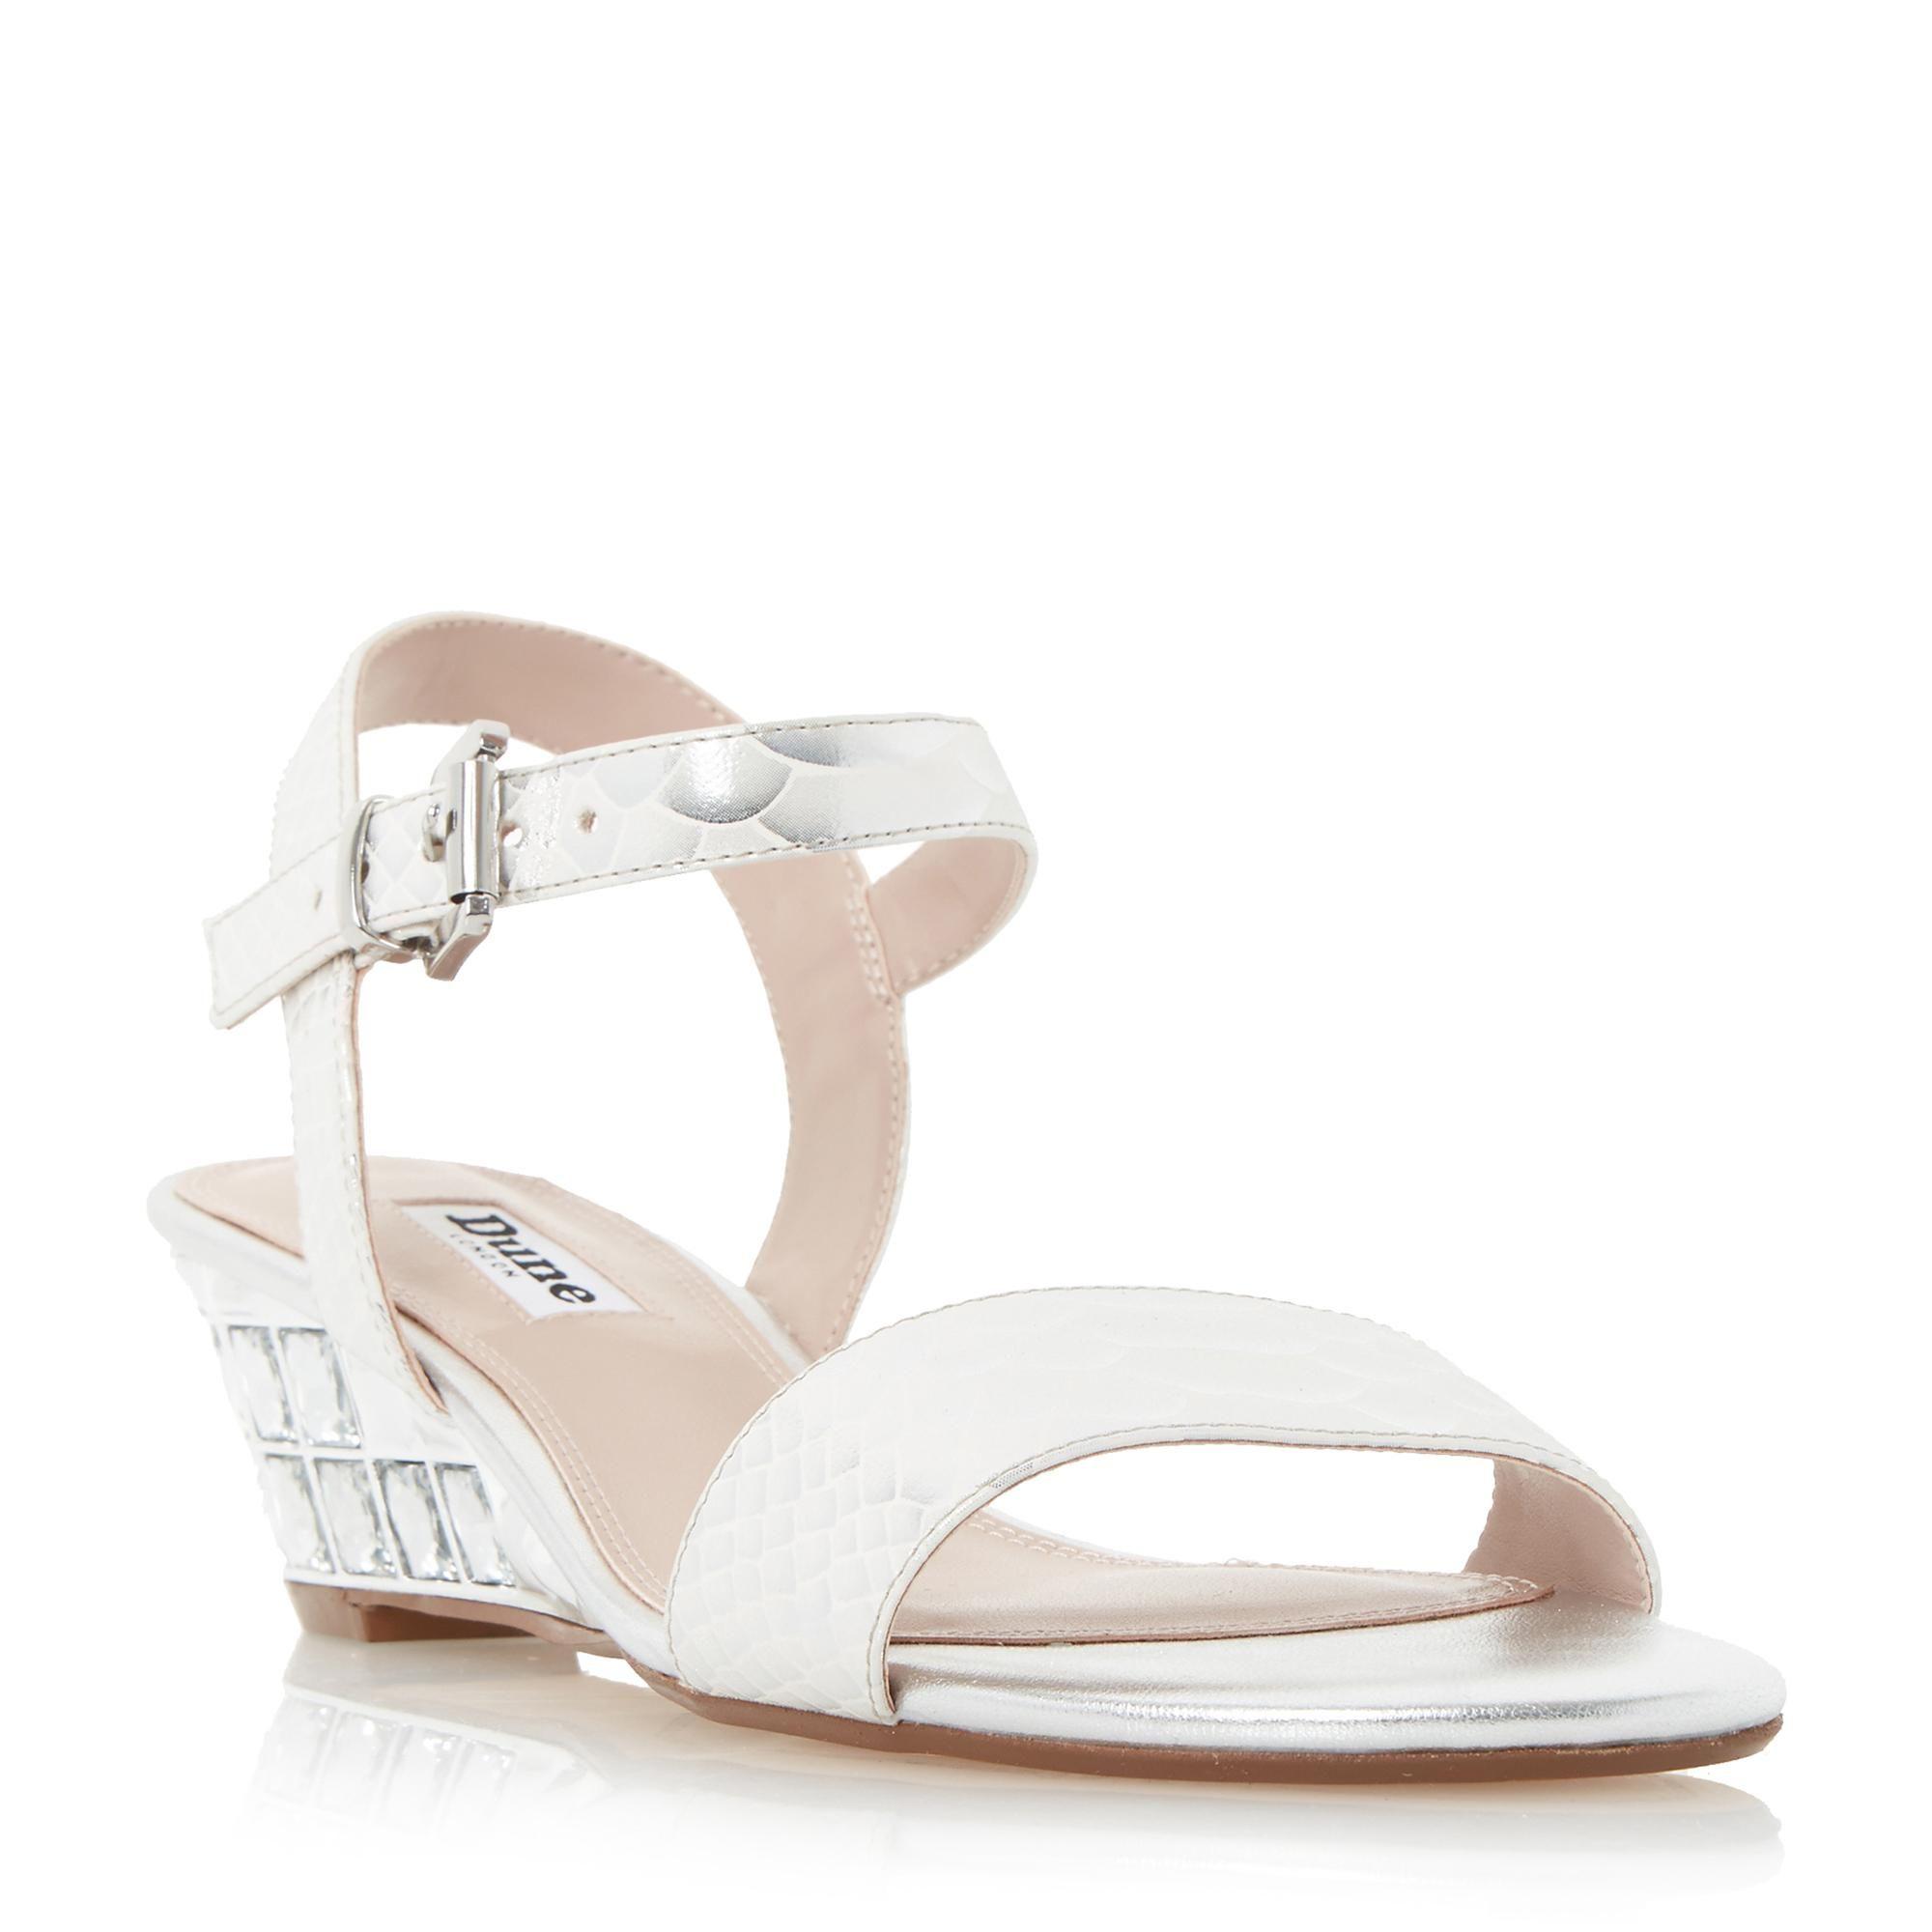 962eb59e24e9e1 DUNE LADIES MONAA - Jewelled Wedge Sandal - silver